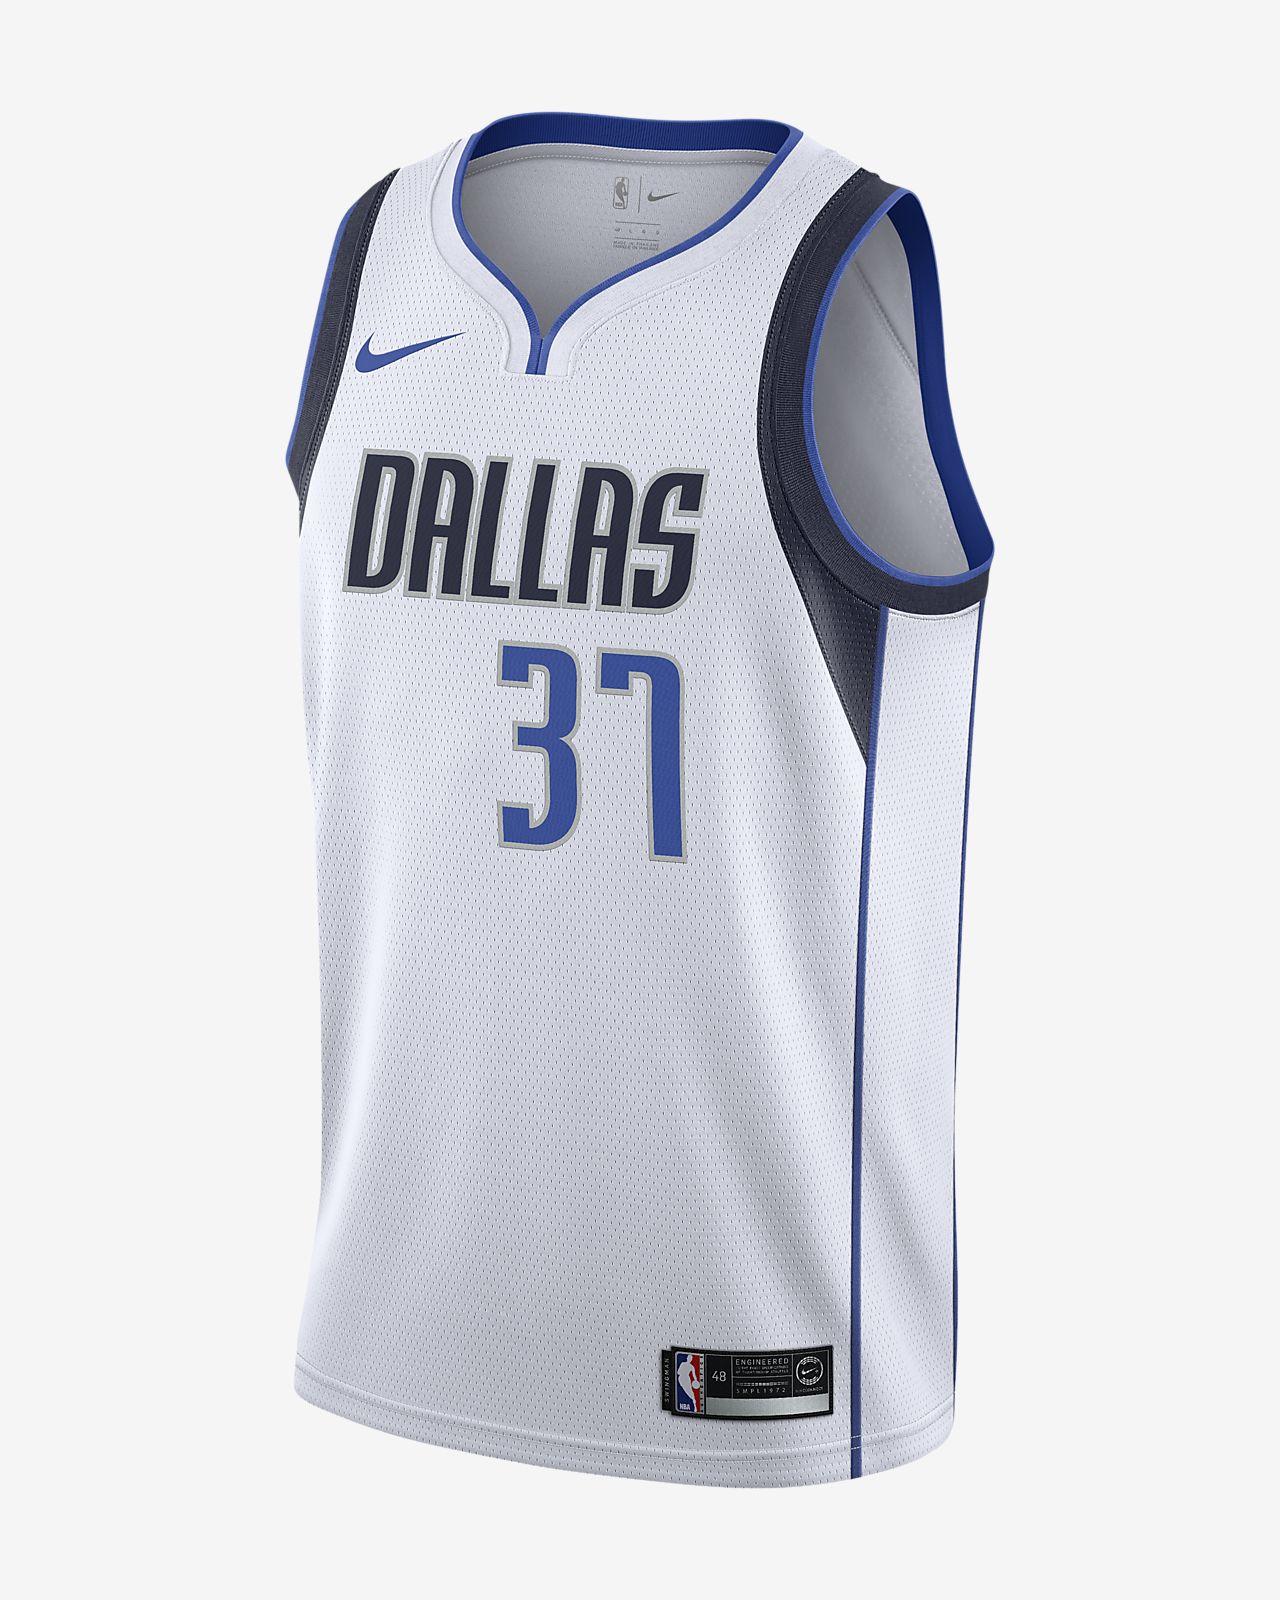 Maglia Nike NBA Connected Kostas Antetokounmpo Association Edition Swingman (Dallas Mavericks) - Uomo